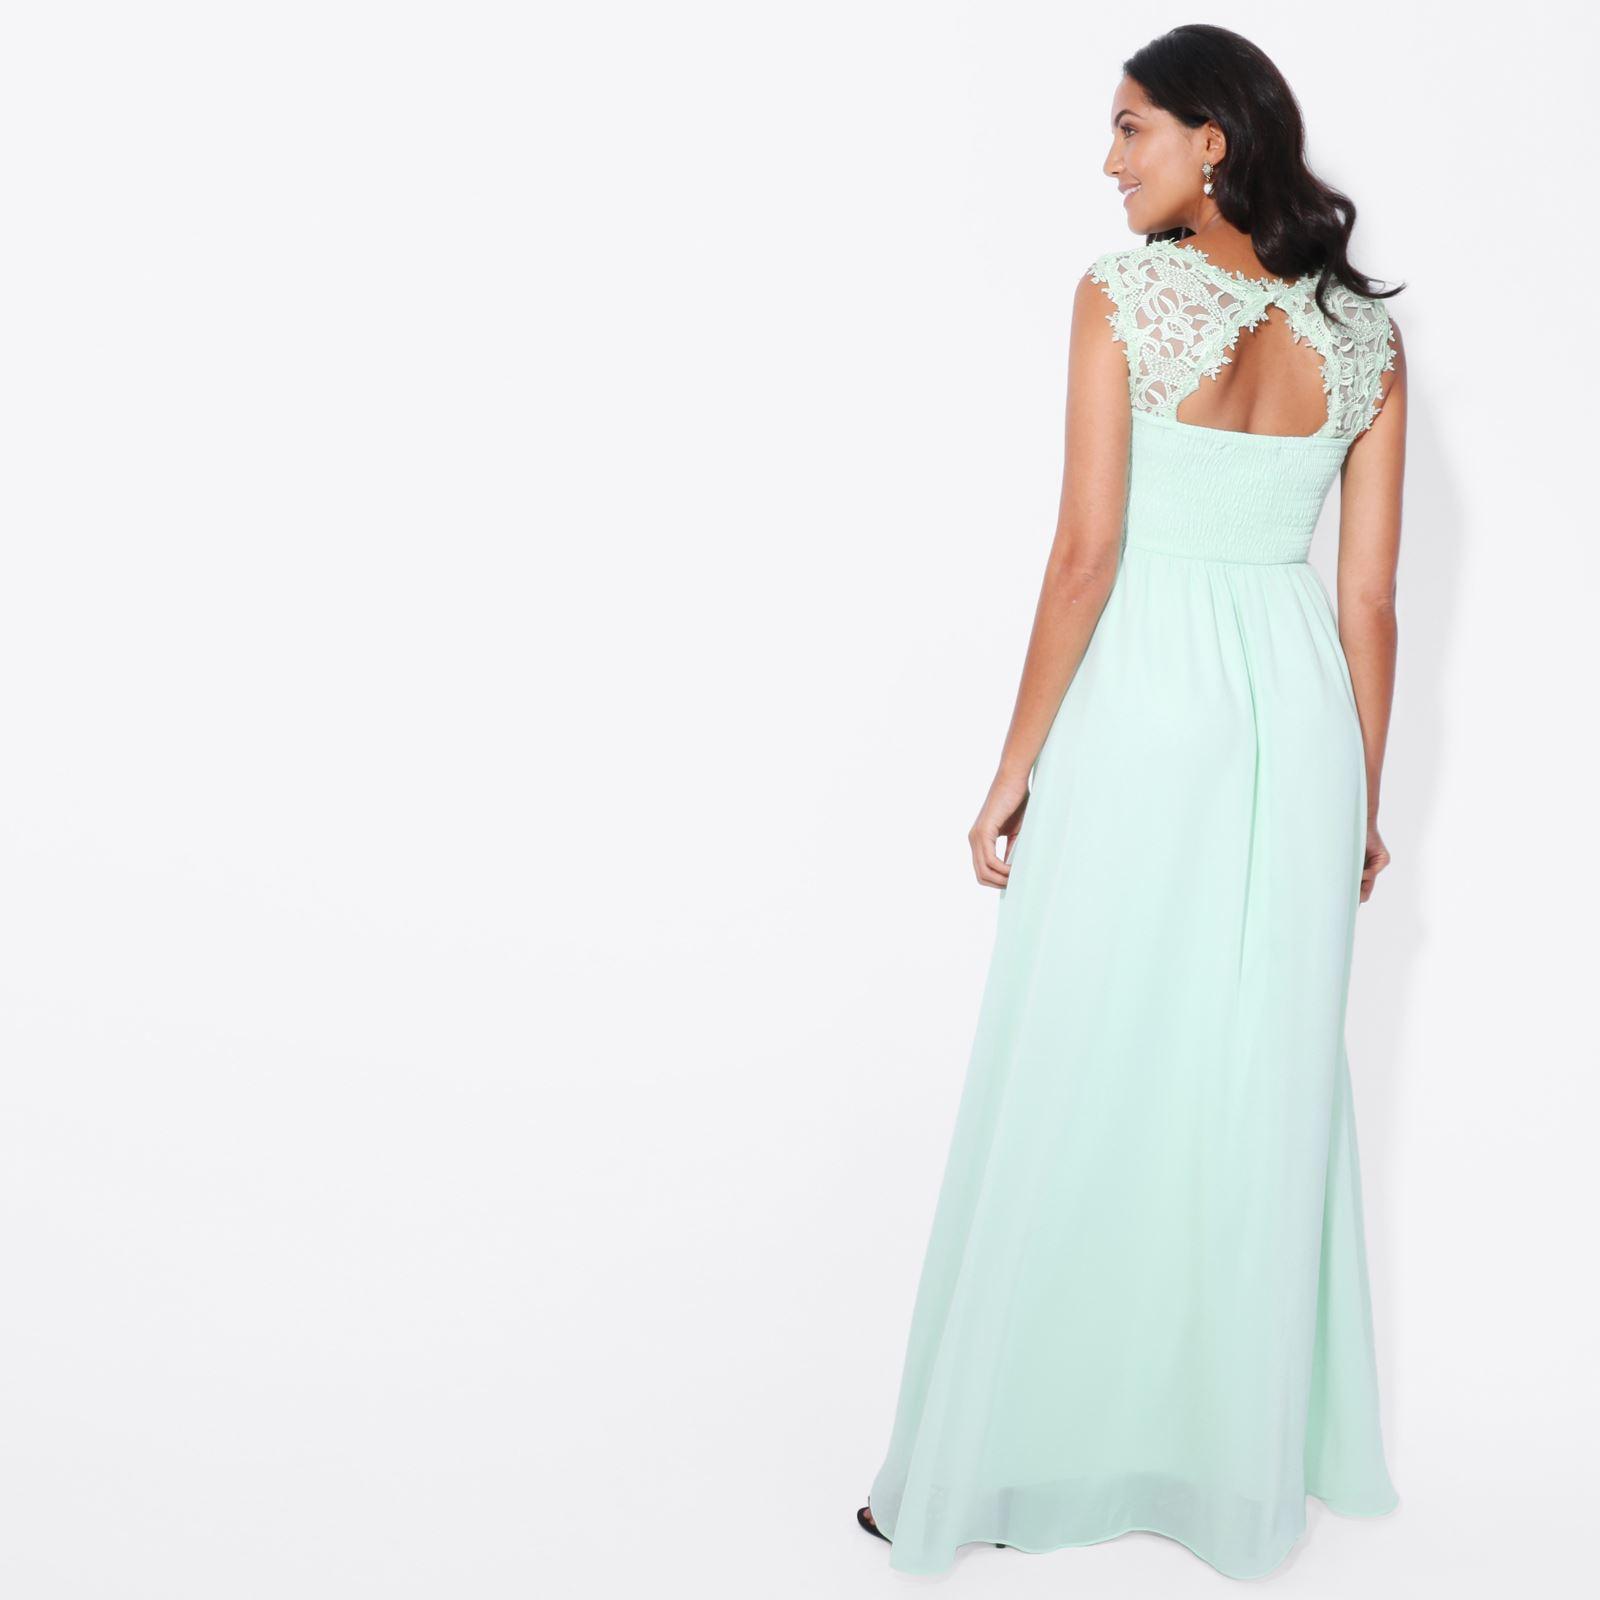 Womens-Wedding-Bridesmaid-Prom-Dress-Formal-One-Off-Shoulder-Long-Evening-8-18 thumbnail 35